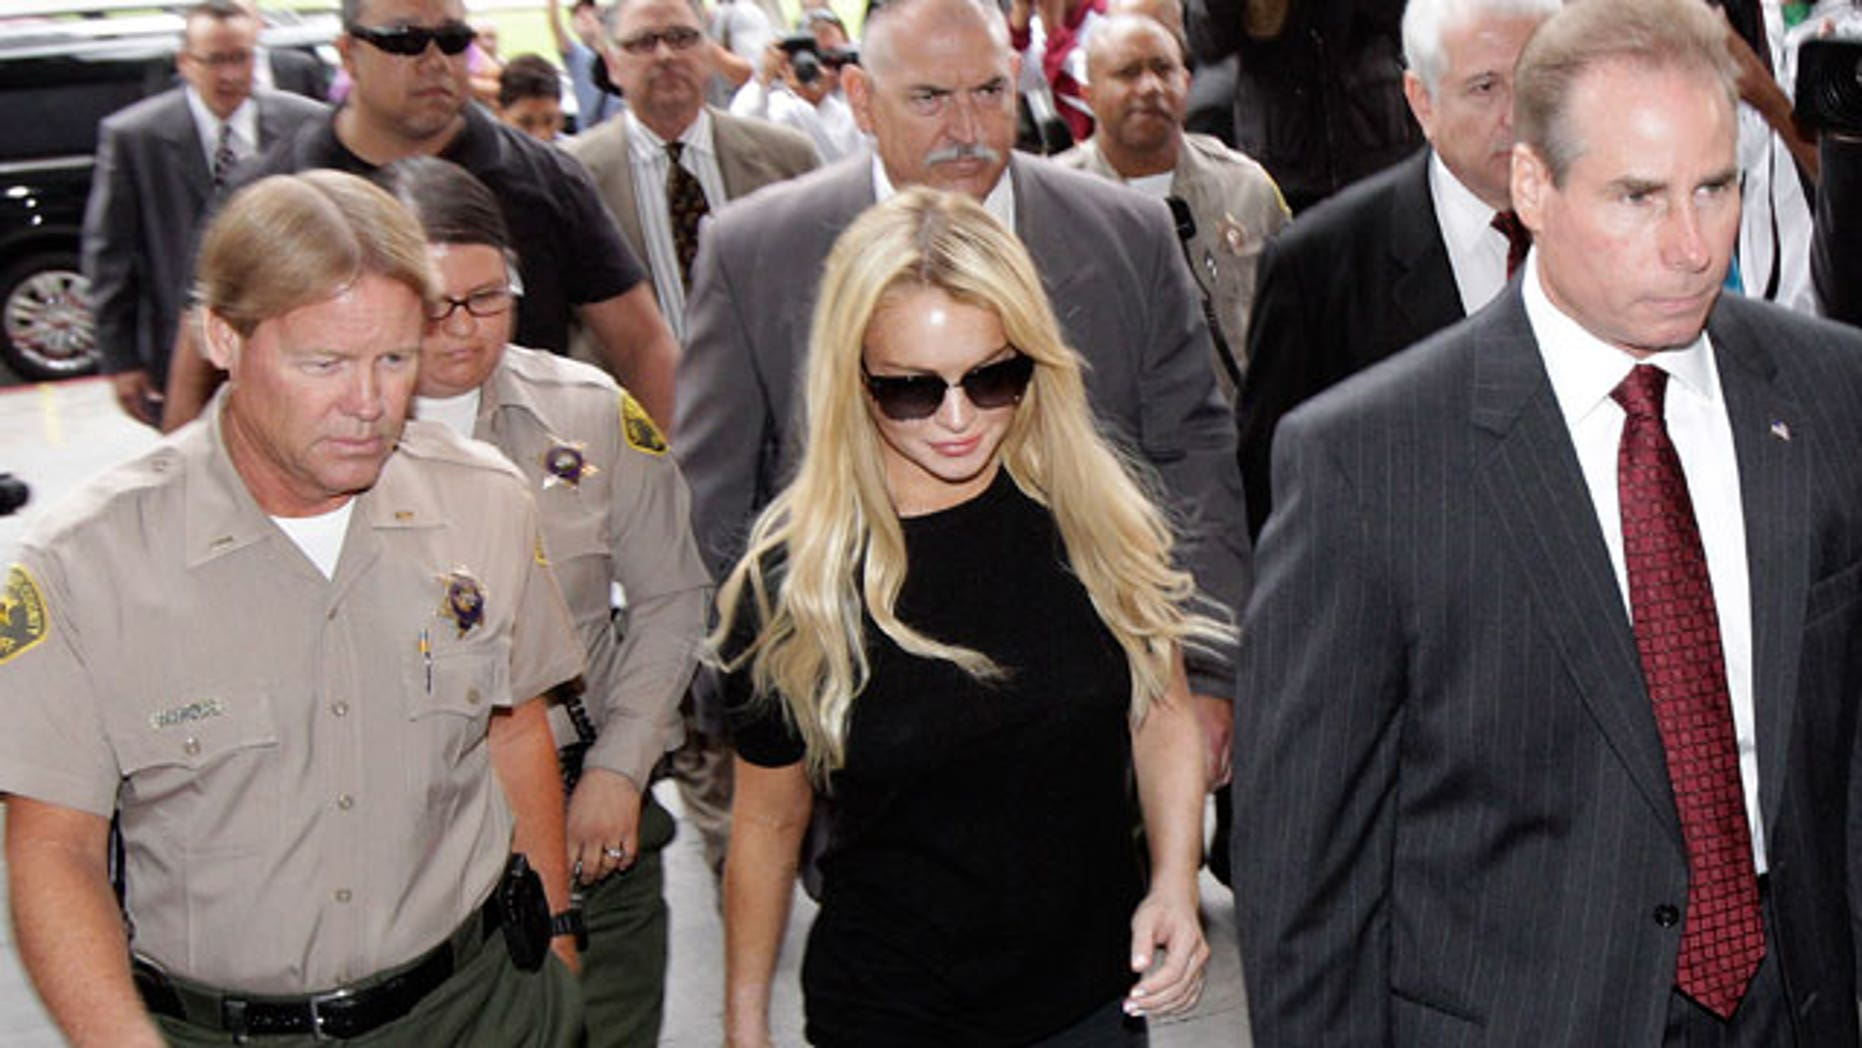 July 6: Lindsay Lohan arrives for a probation hearing in Los Angeles.